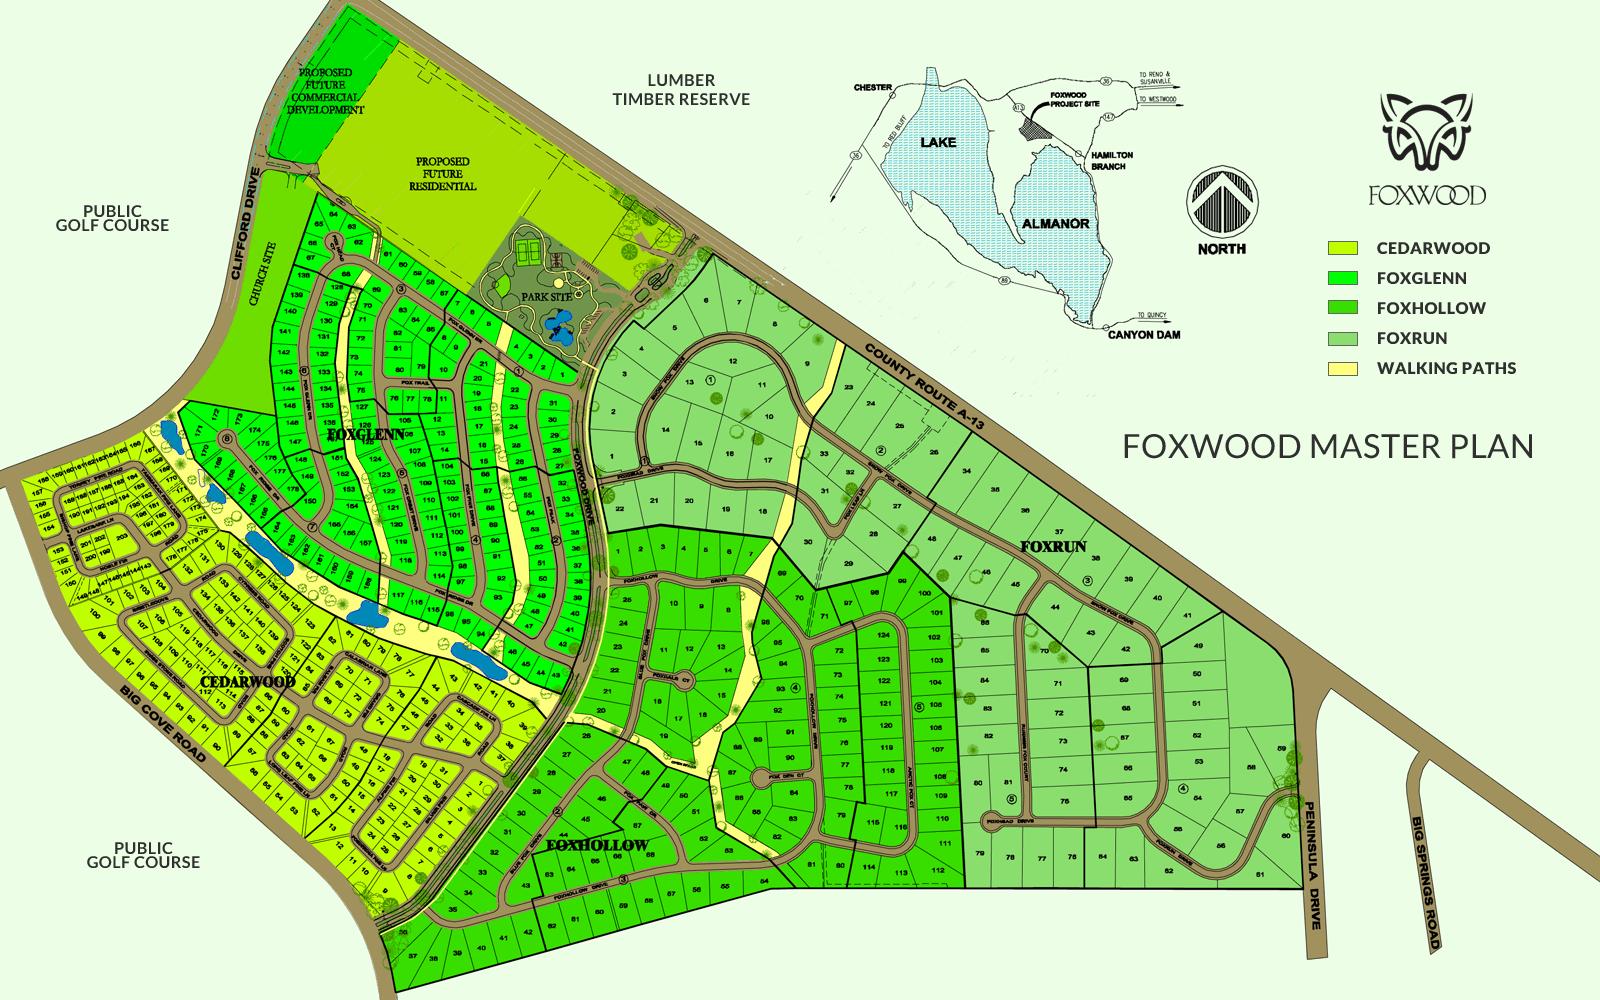 Foxwood Master Plan